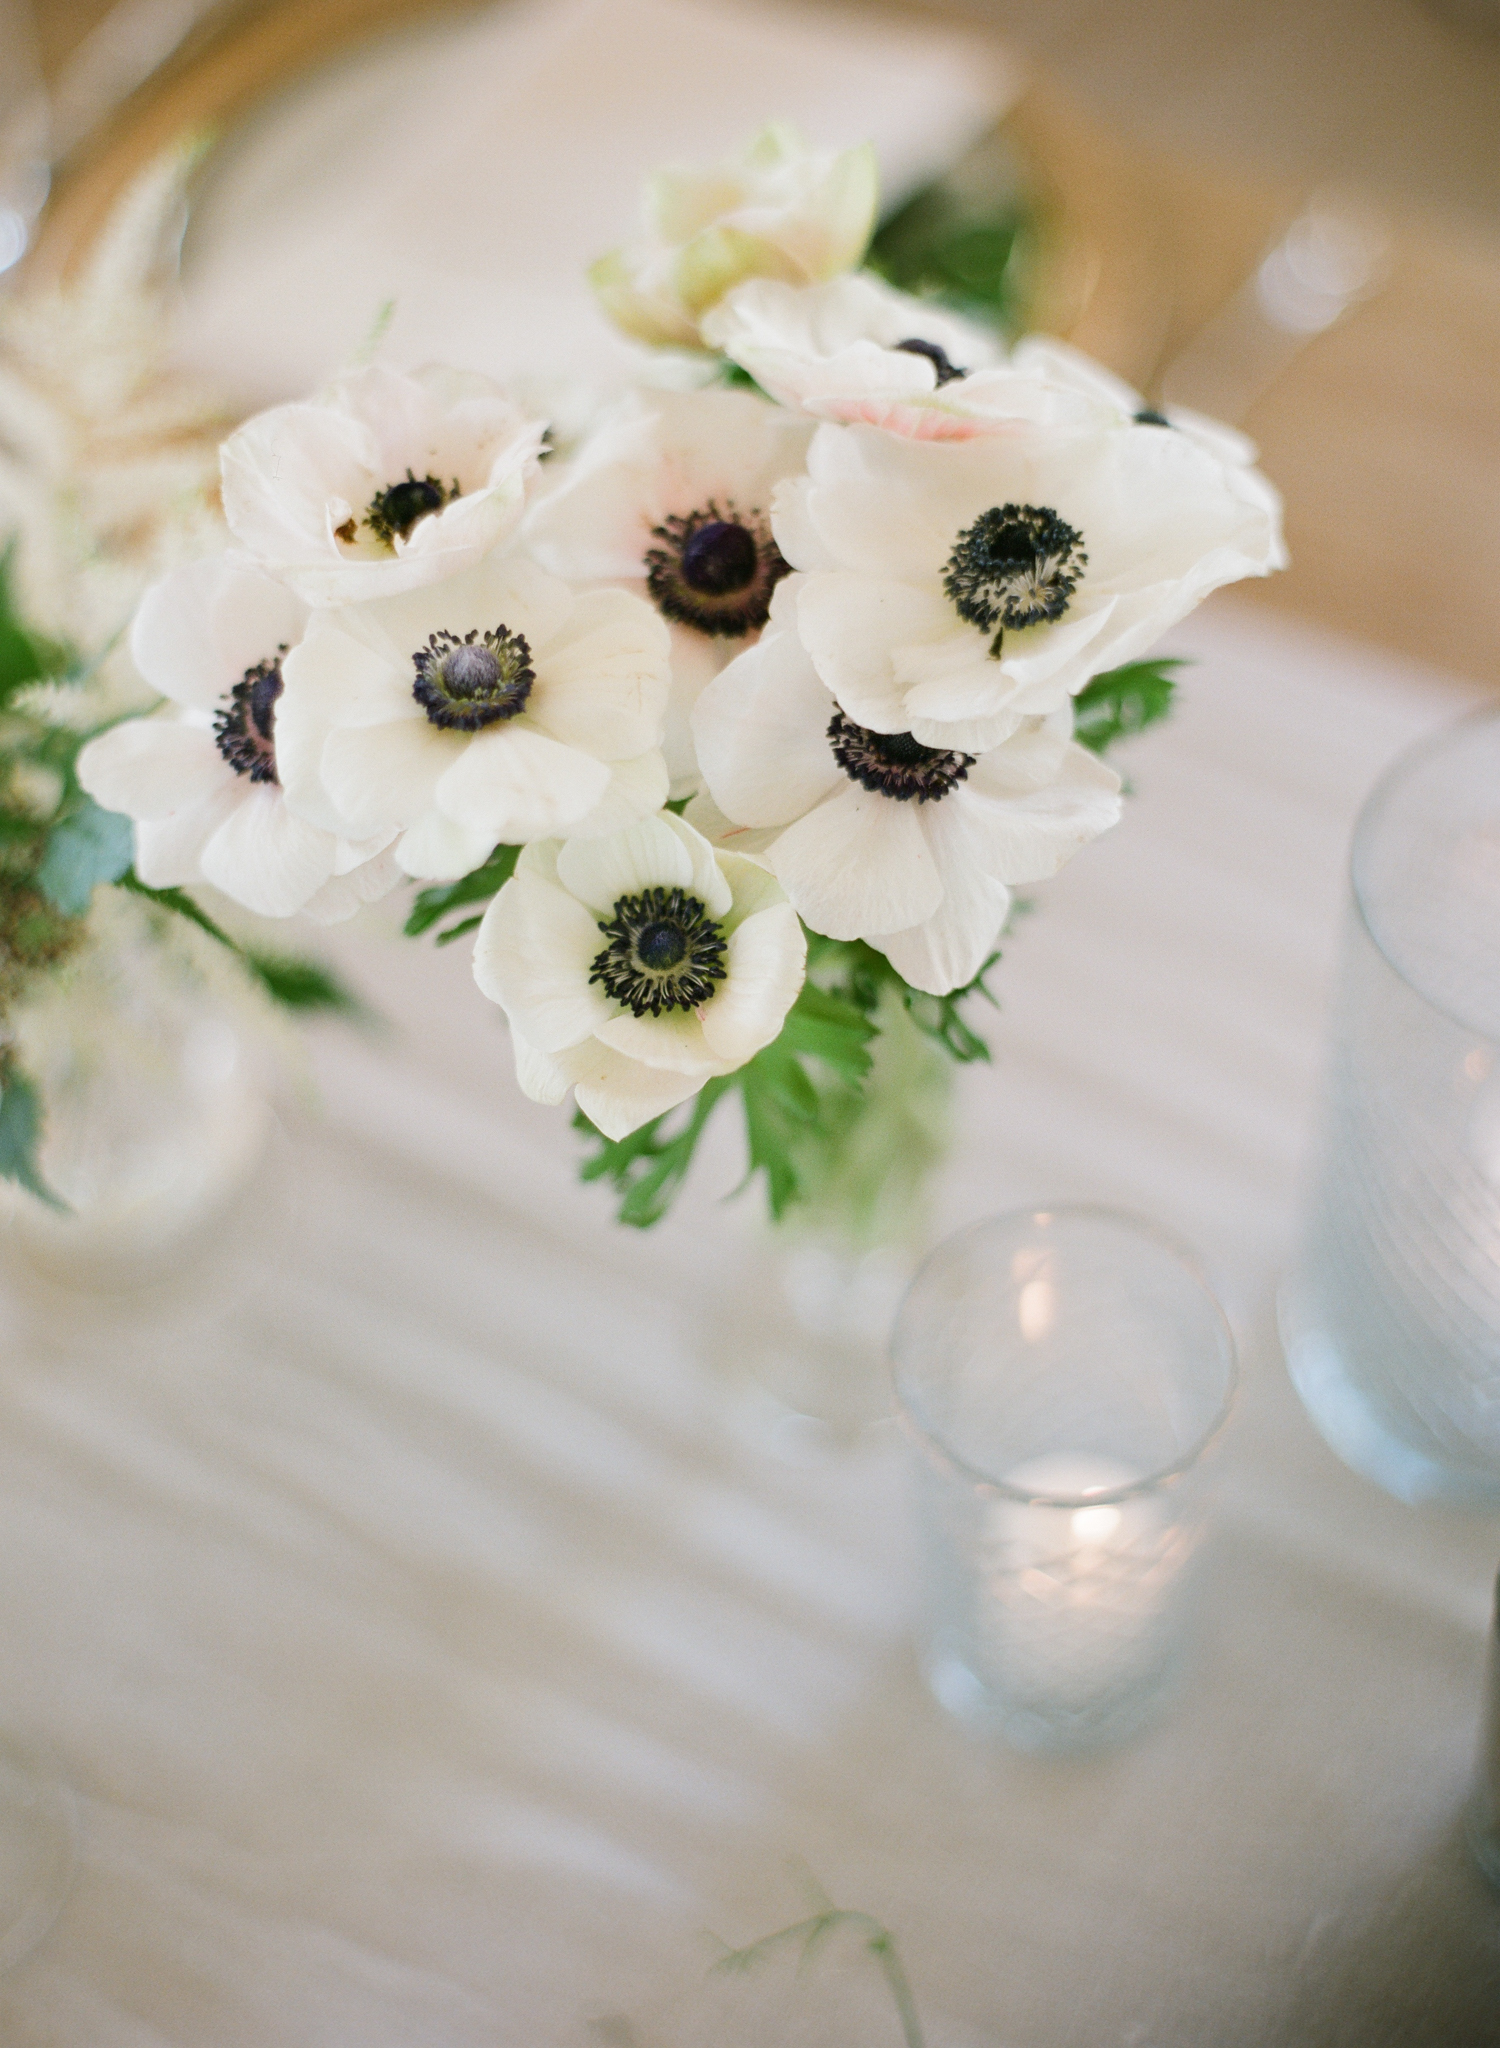 21 Private Estate Wedding Event Design by Joy Proctor.JPG